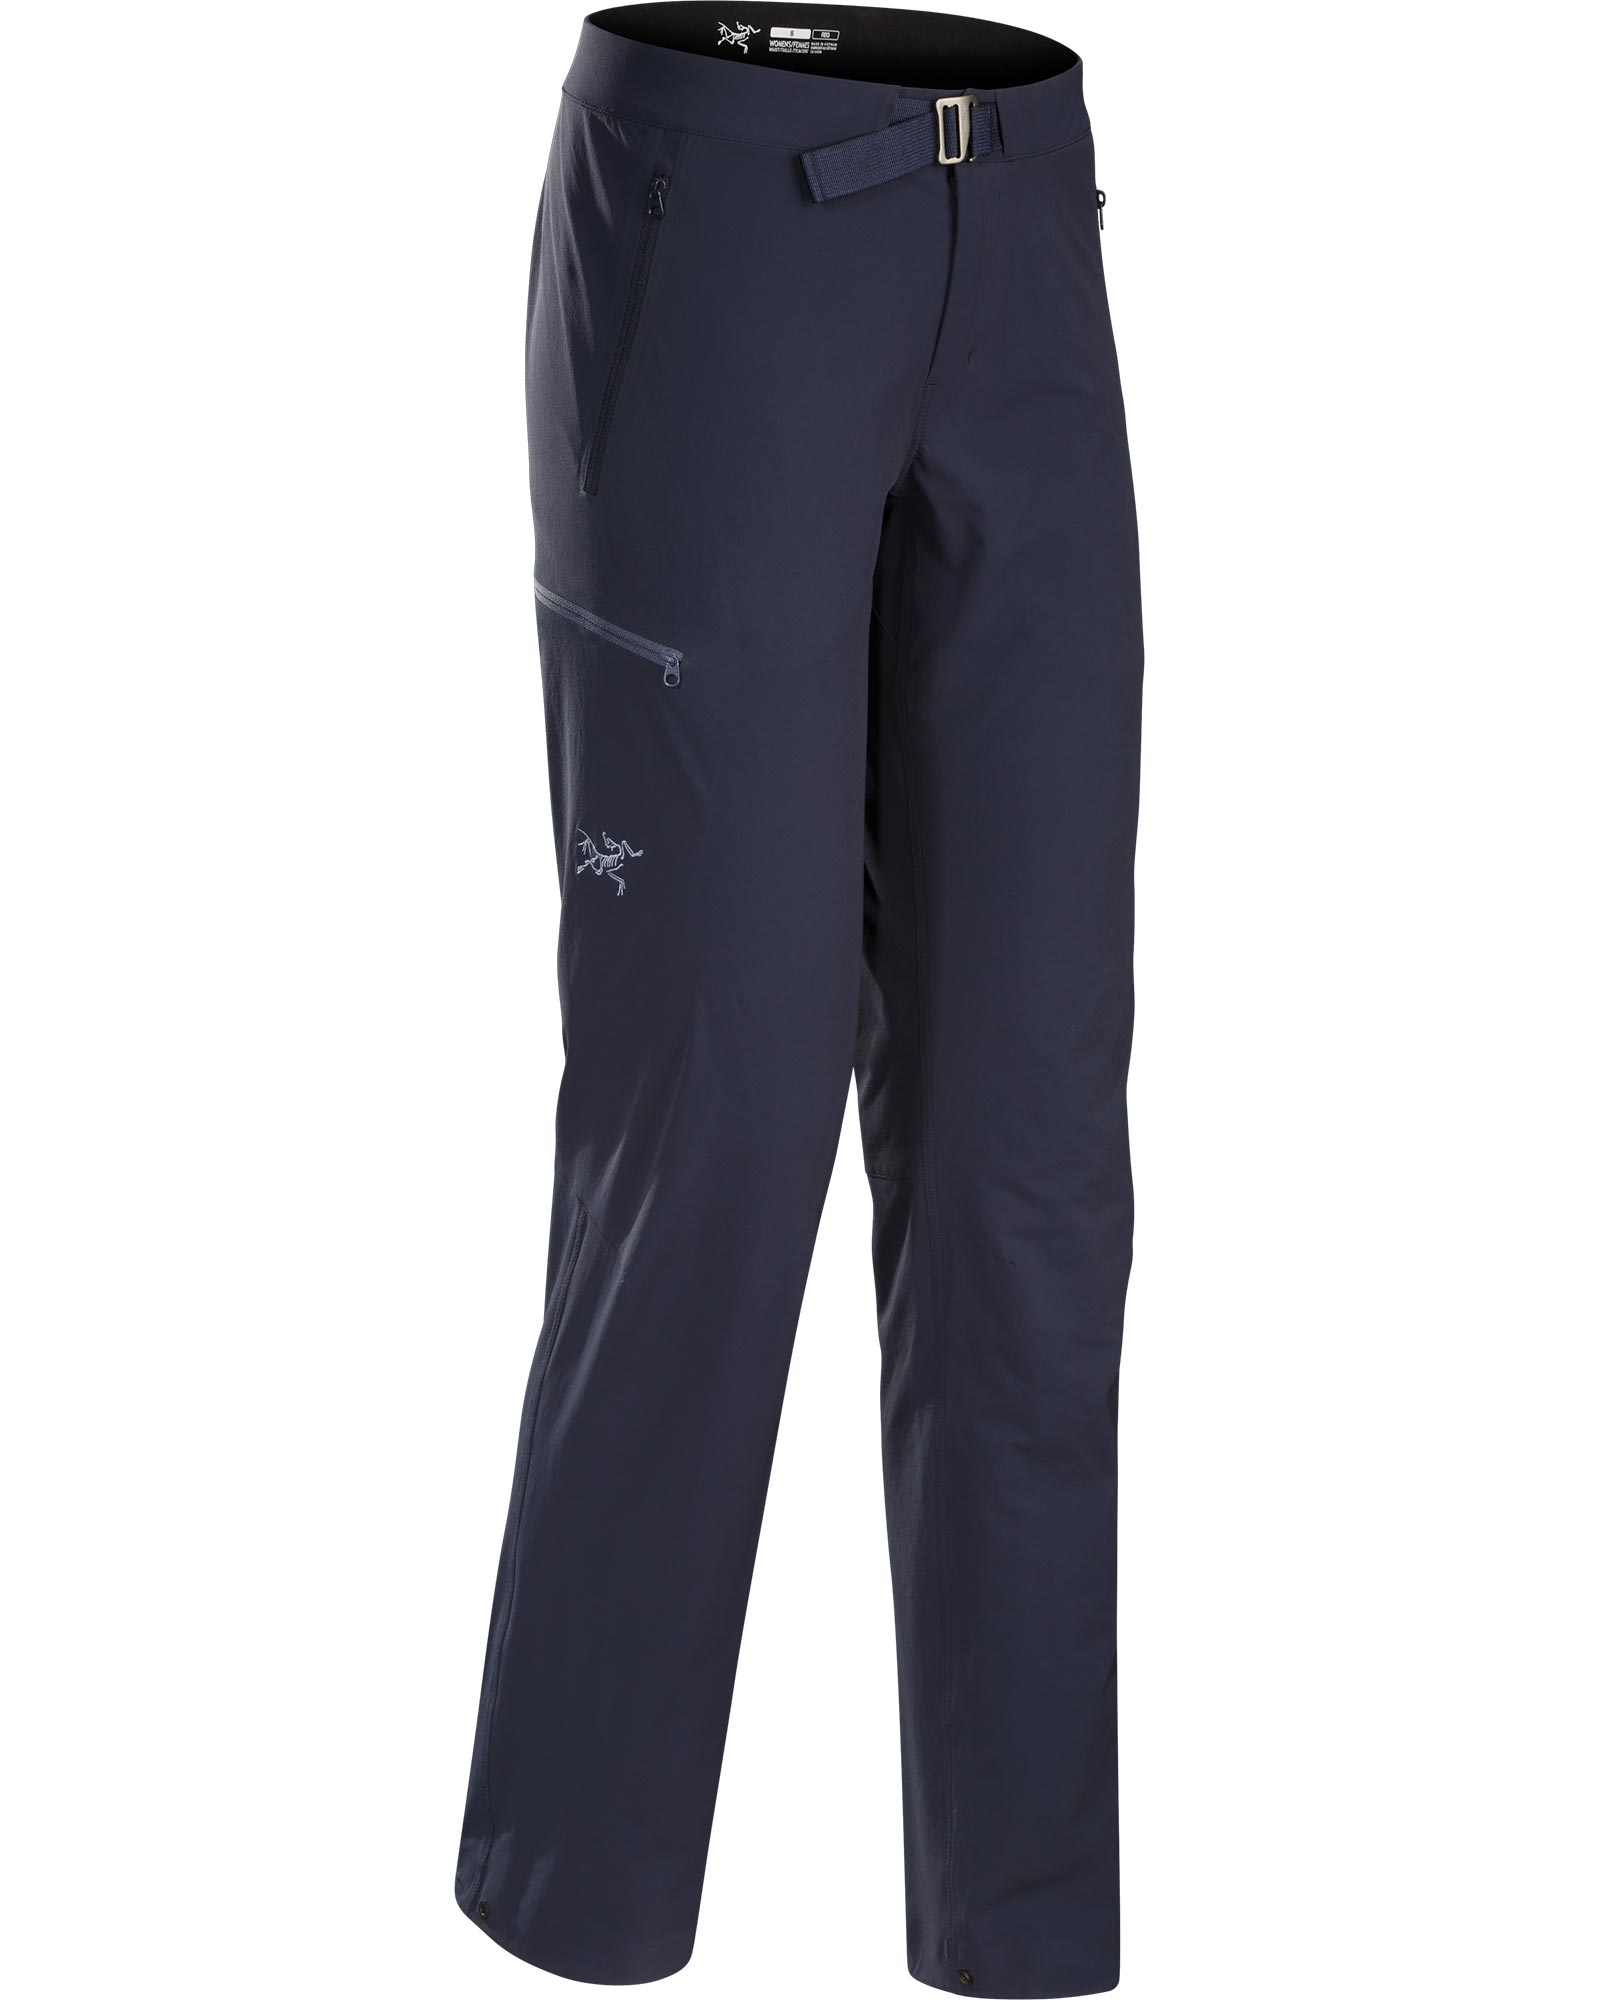 Arc'teryx Women's Gamma LT Pants Regular Leg 0